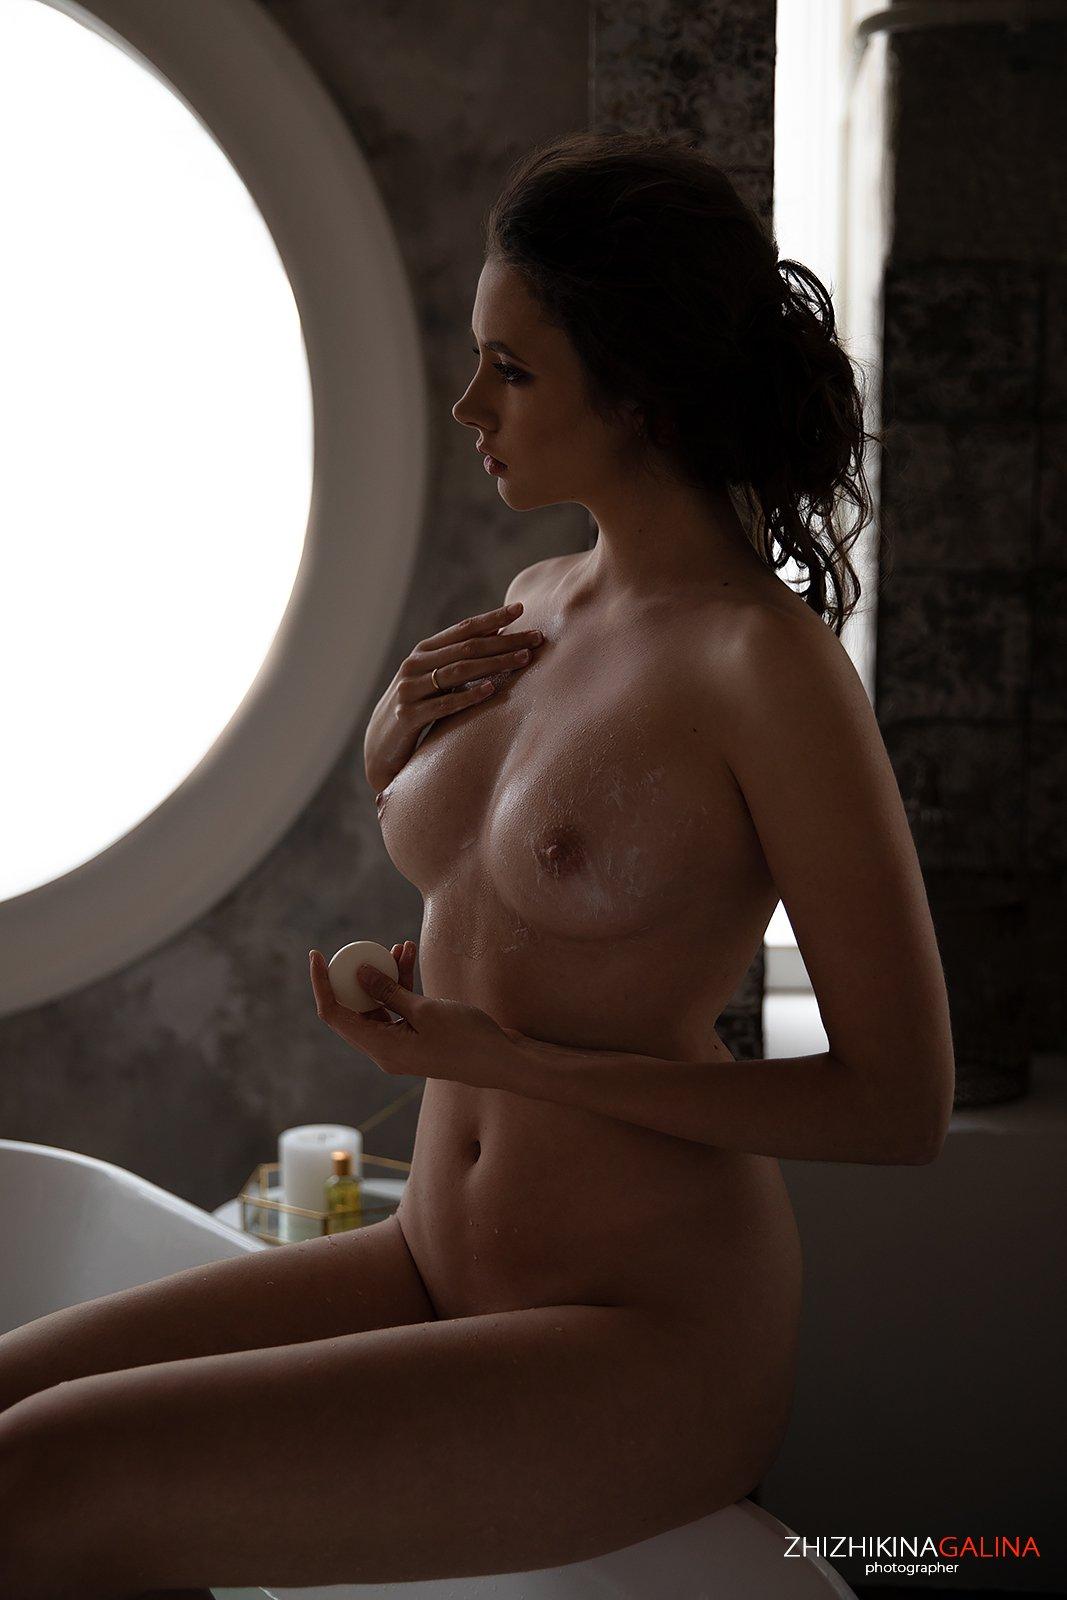 девушка, купание, мокрая, ню, артню, прикосновение, нежность, nude, artnu, girl, naked, portrait, Галина Жижикина